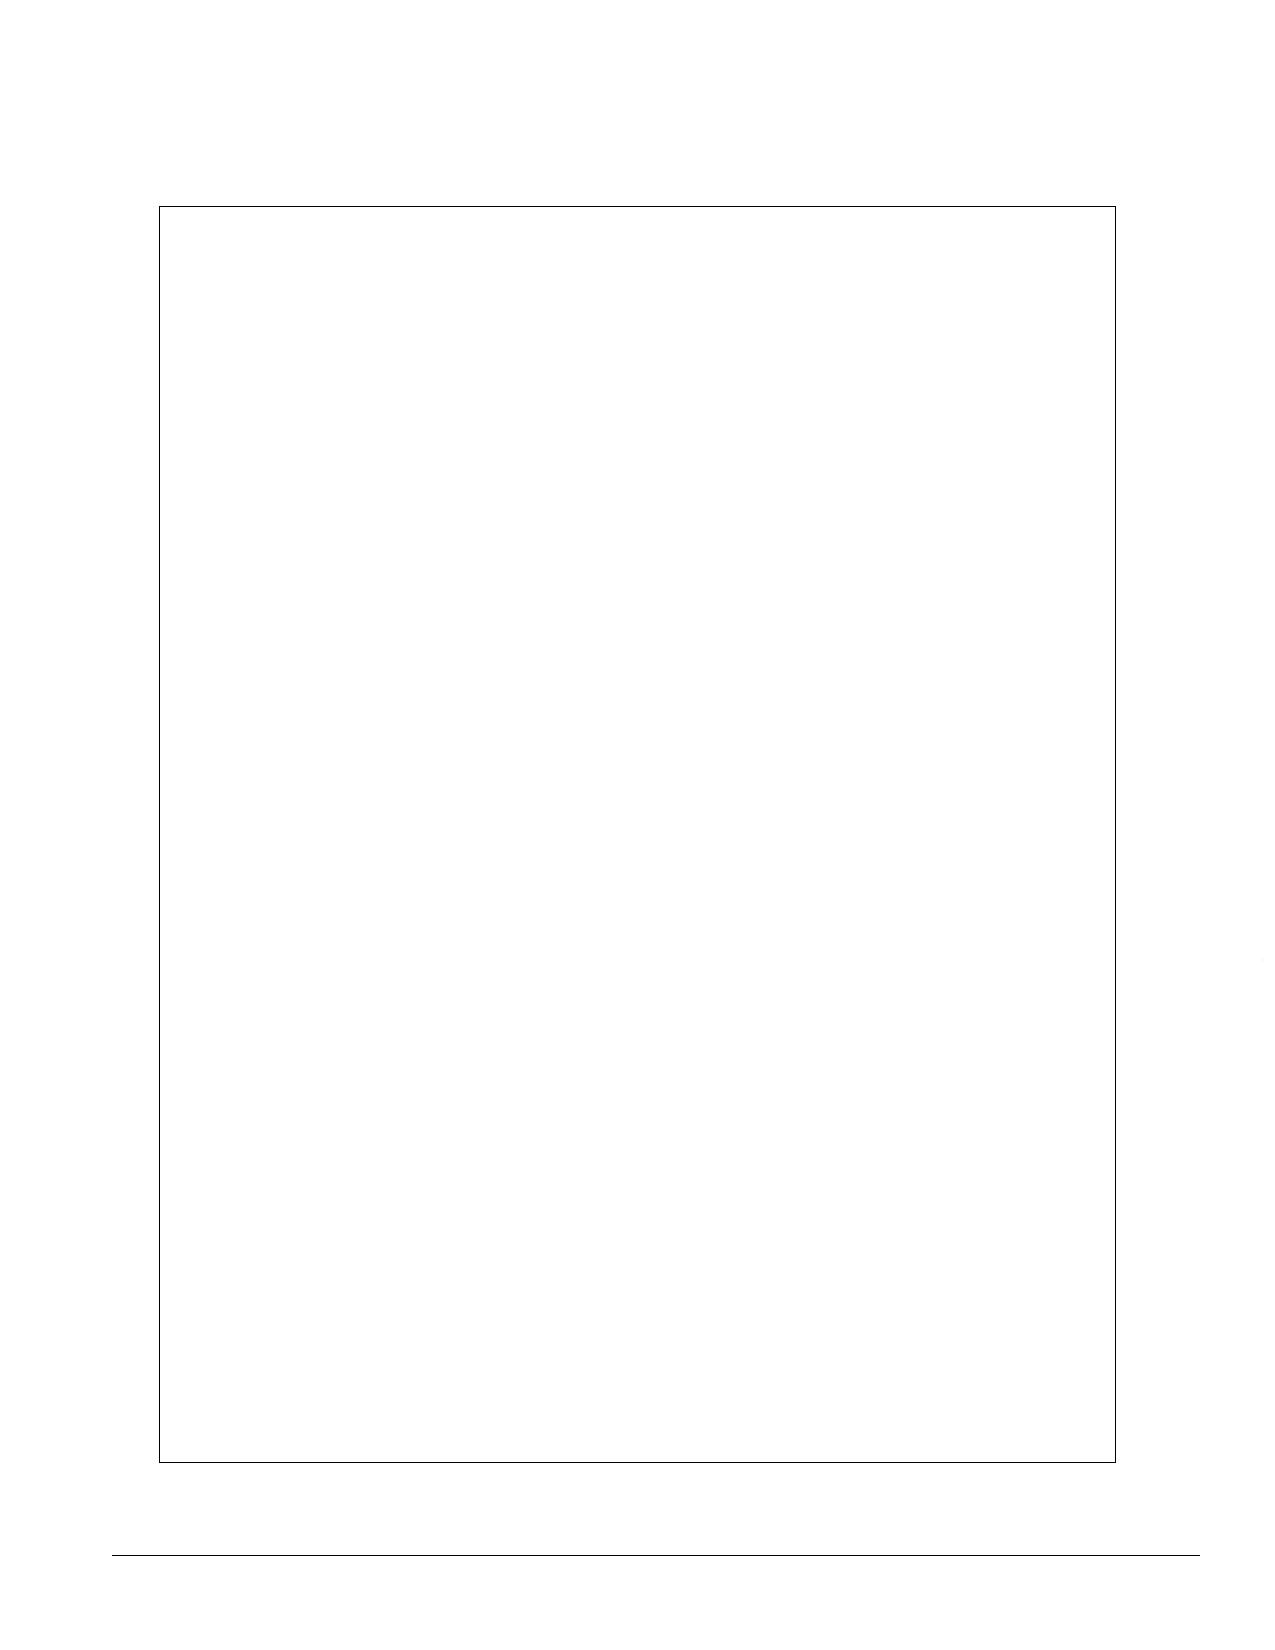 Q2004K31V datasheet